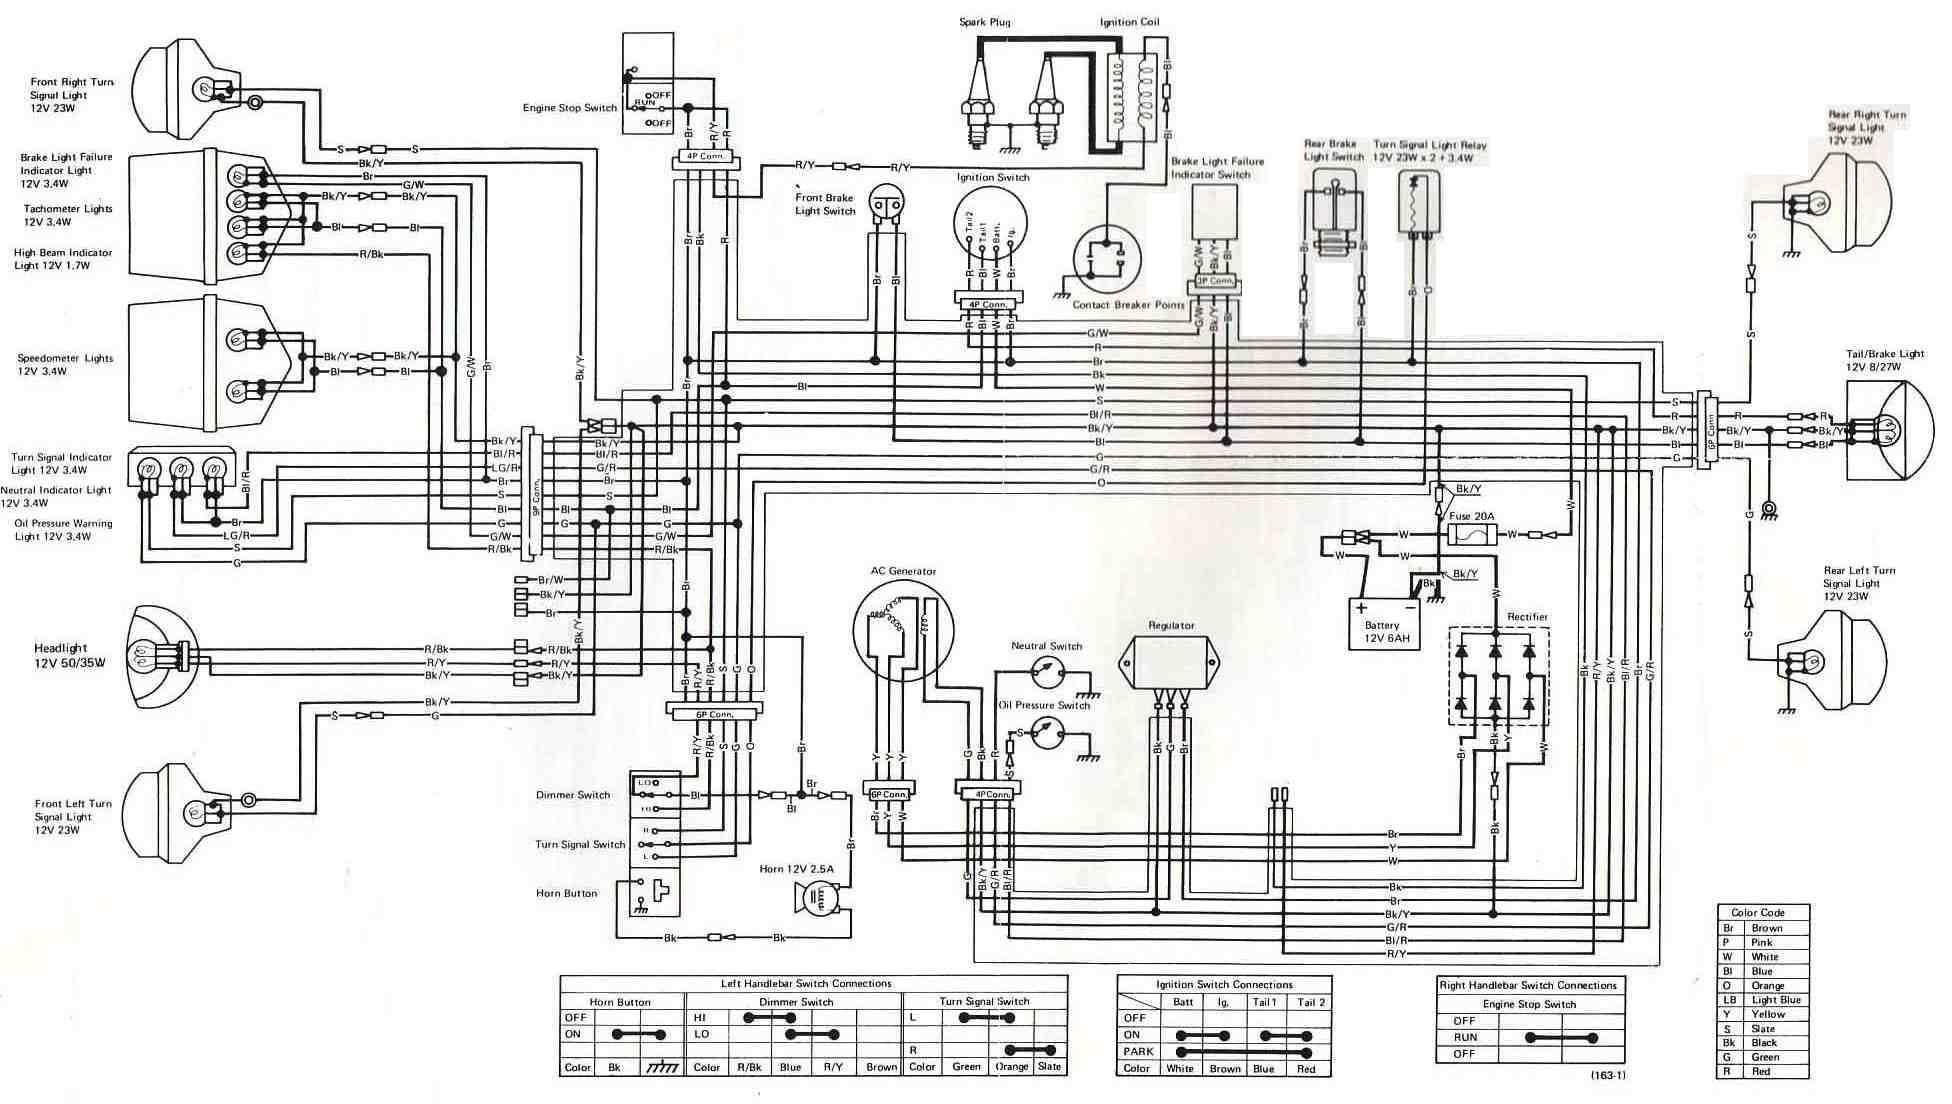 Kawasaki Ninja 500r Wiring Diagram